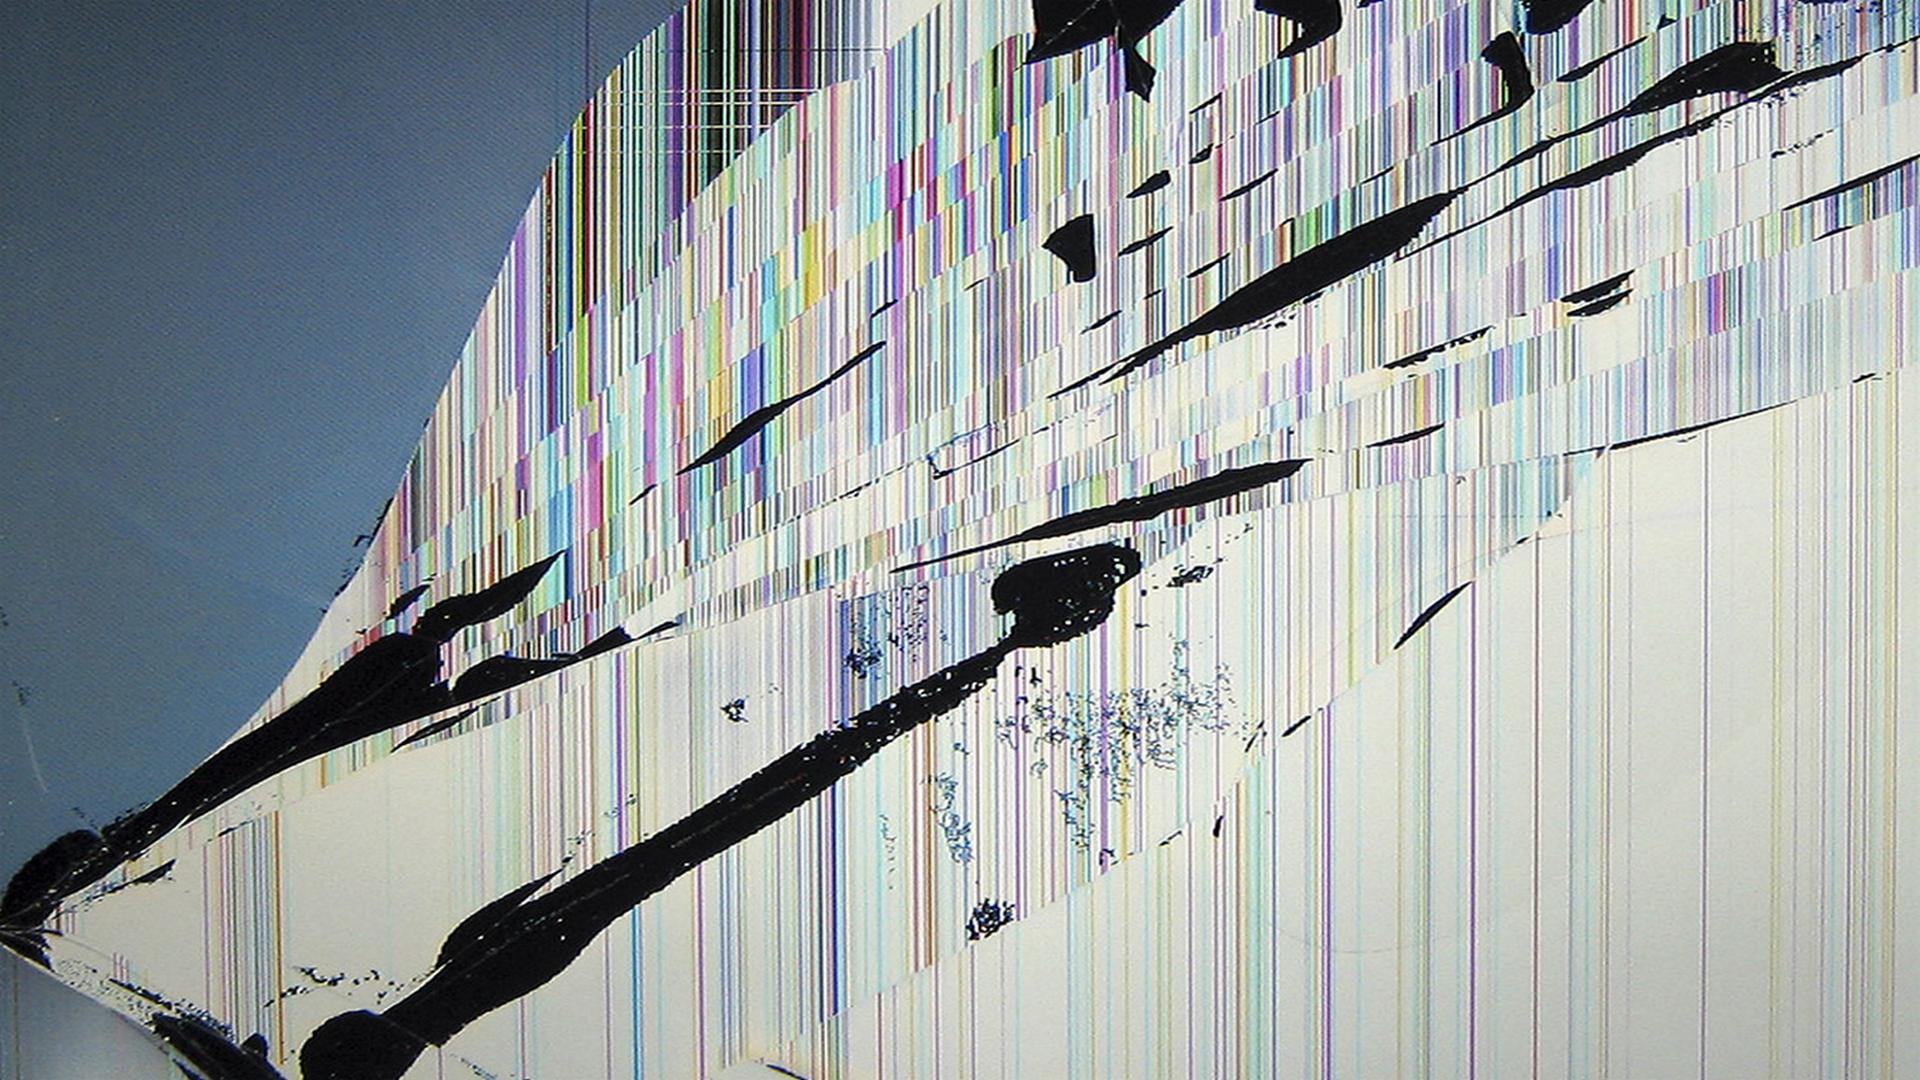 Wallpaper broken screen   SF Wallpaper 1920x1080